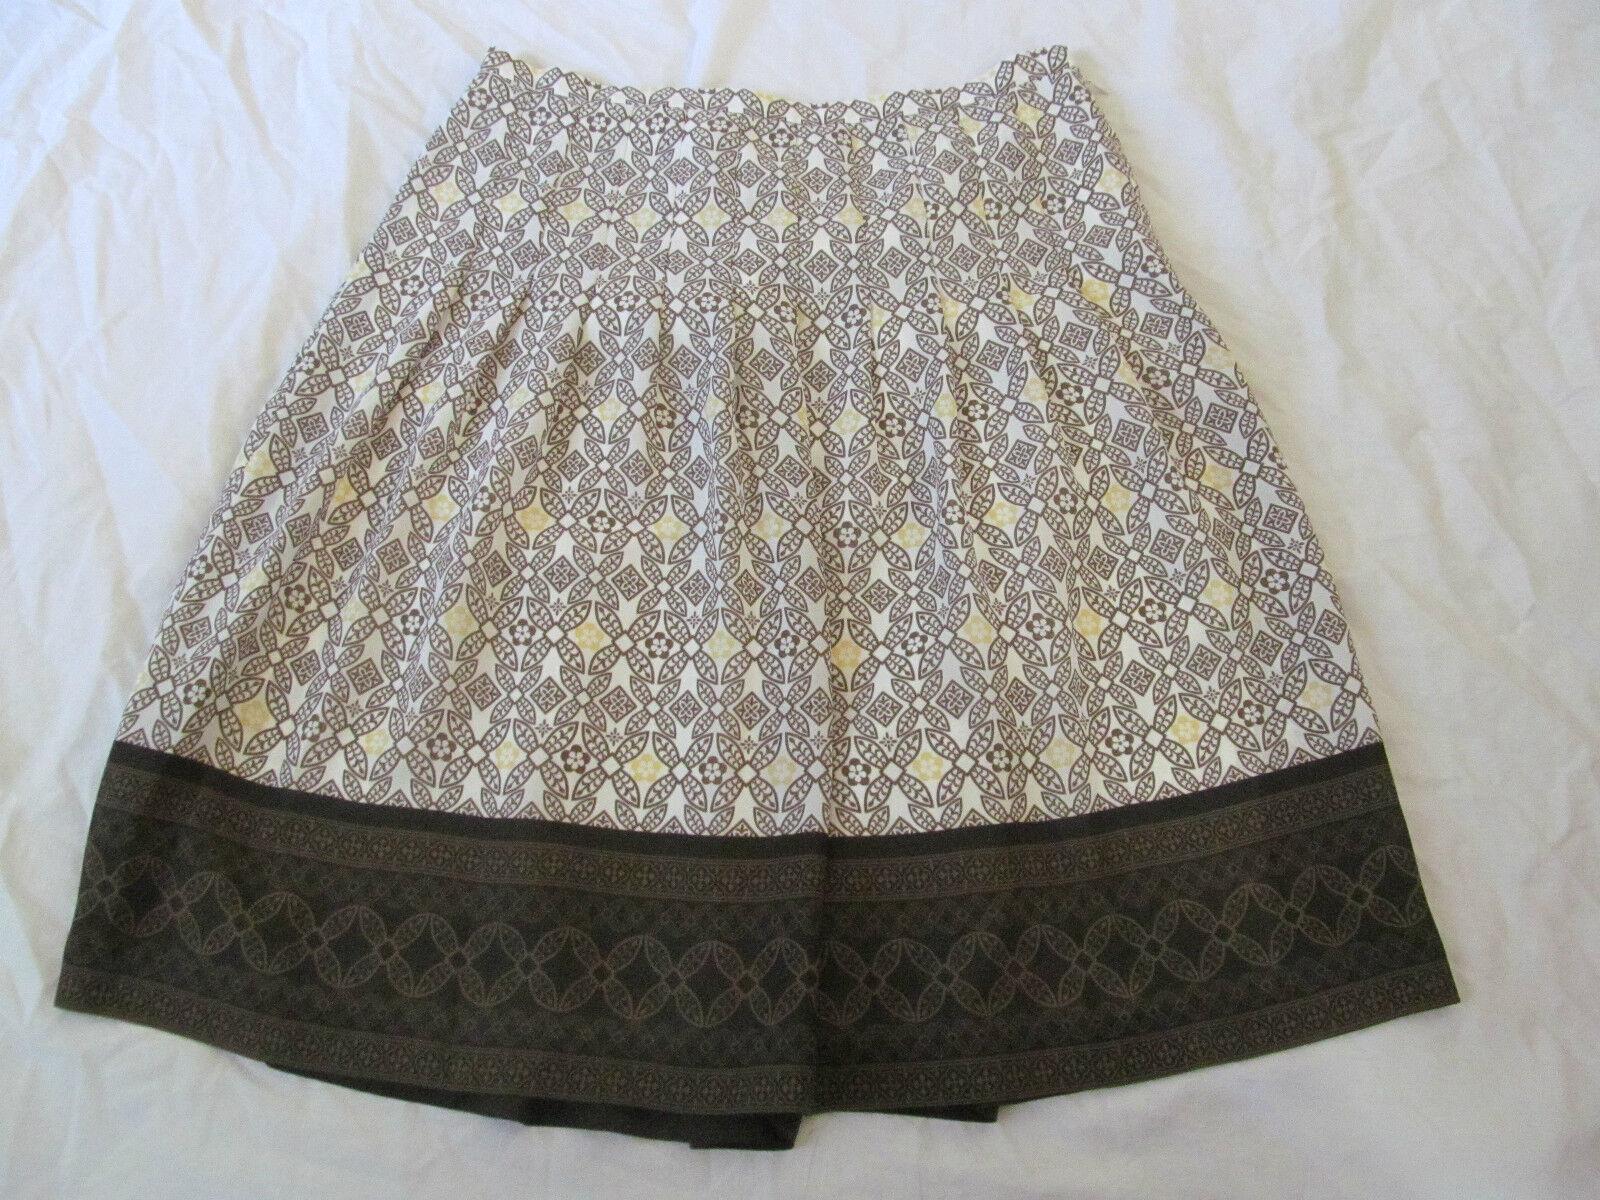 cfbc0310cefcb Women's Ann Taylor Loft Petites Paisley White & Brown Skirt Size 4P ...